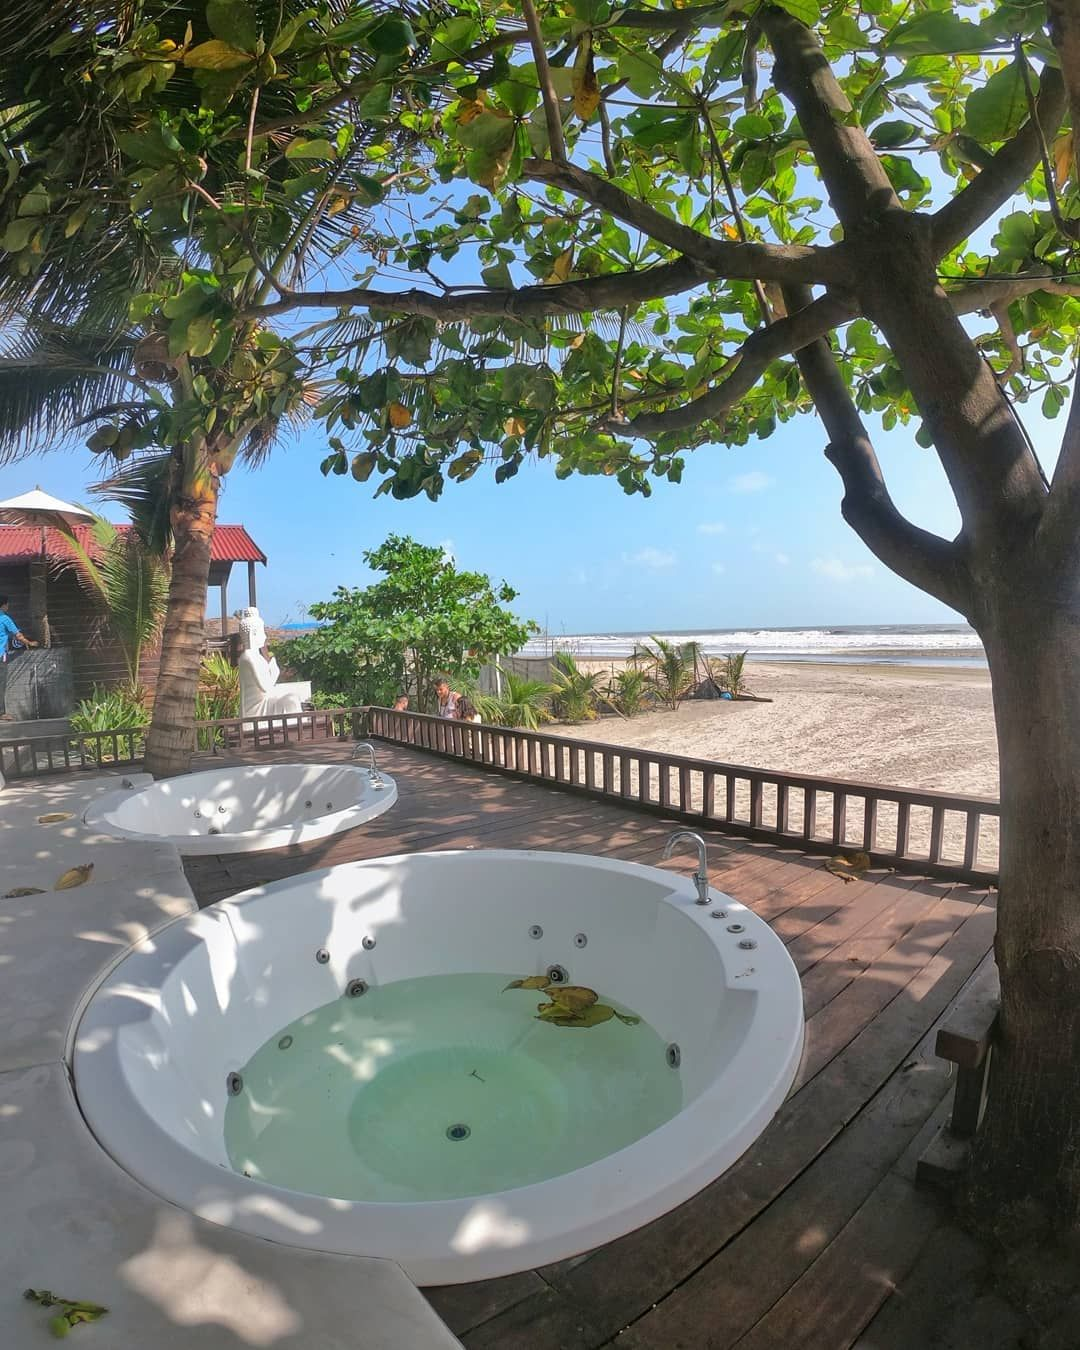 Jacuzzis looking out at the sea. Isn't this a perfect place for a laidback sundowner?! Location: Sinq beach, Morjim  #sinqbeach #sinqbeachclub #sinqbeachresort #morjimbeach #morjim #goa #tenderfoottraveller #jaccuzi #beachview #goa #sogoa #goadiaries #tenderfoottraveller  #goavibes #goaindia #whpwanderlust #india #gopro #gopro_moment #gogoagone #visitgoa #mygoa #northgoa #incrediblegoa #letstravel #beachday #letsgoeverywhere